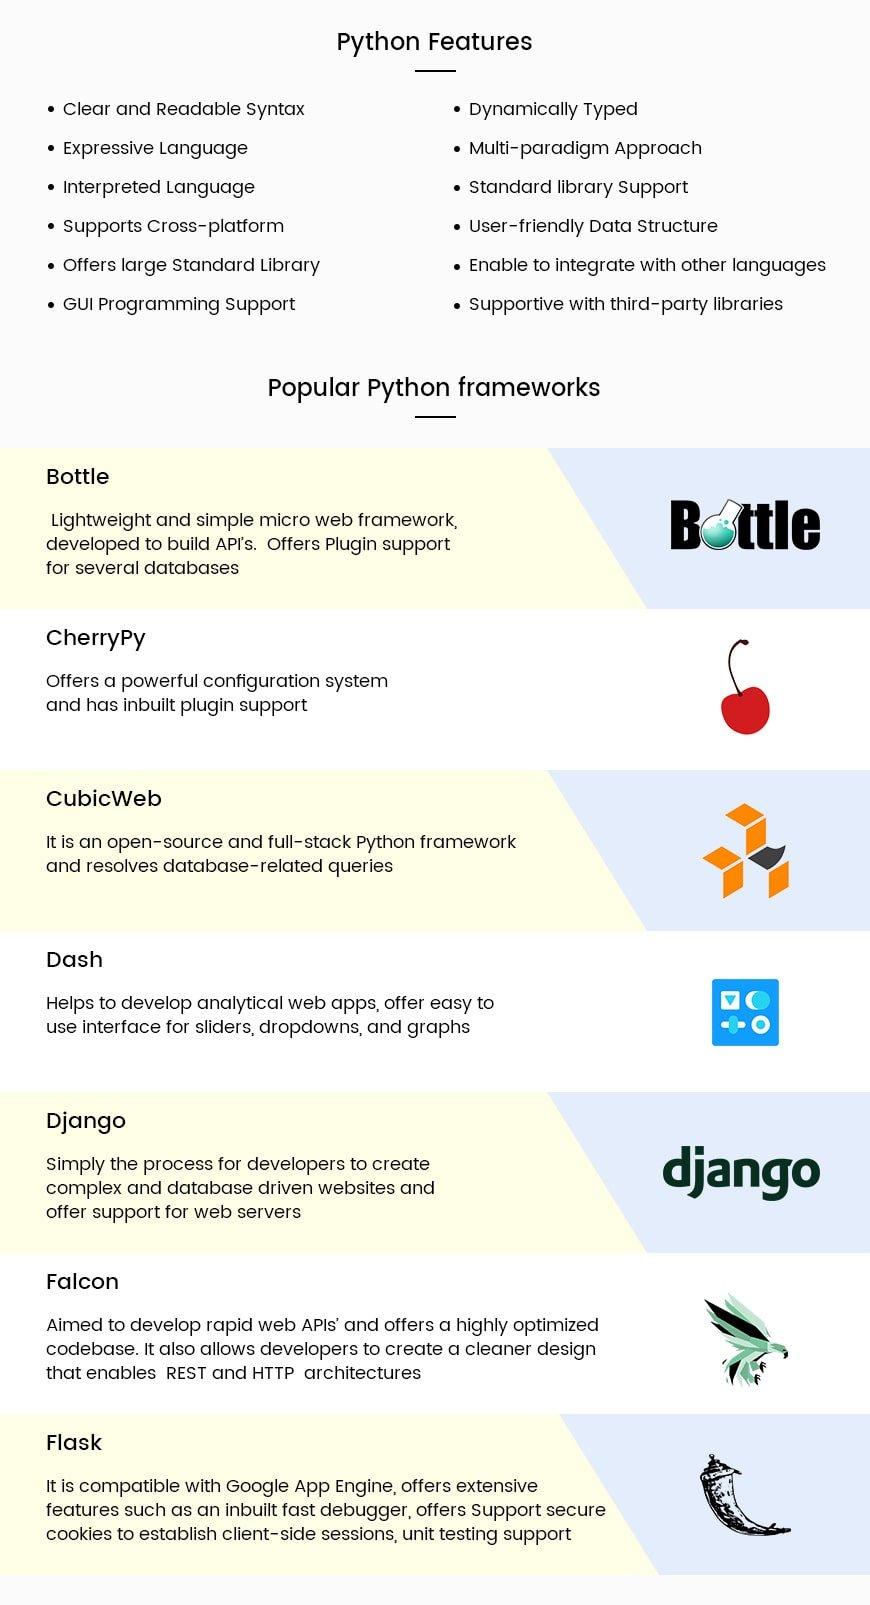 Python frameworks & Features